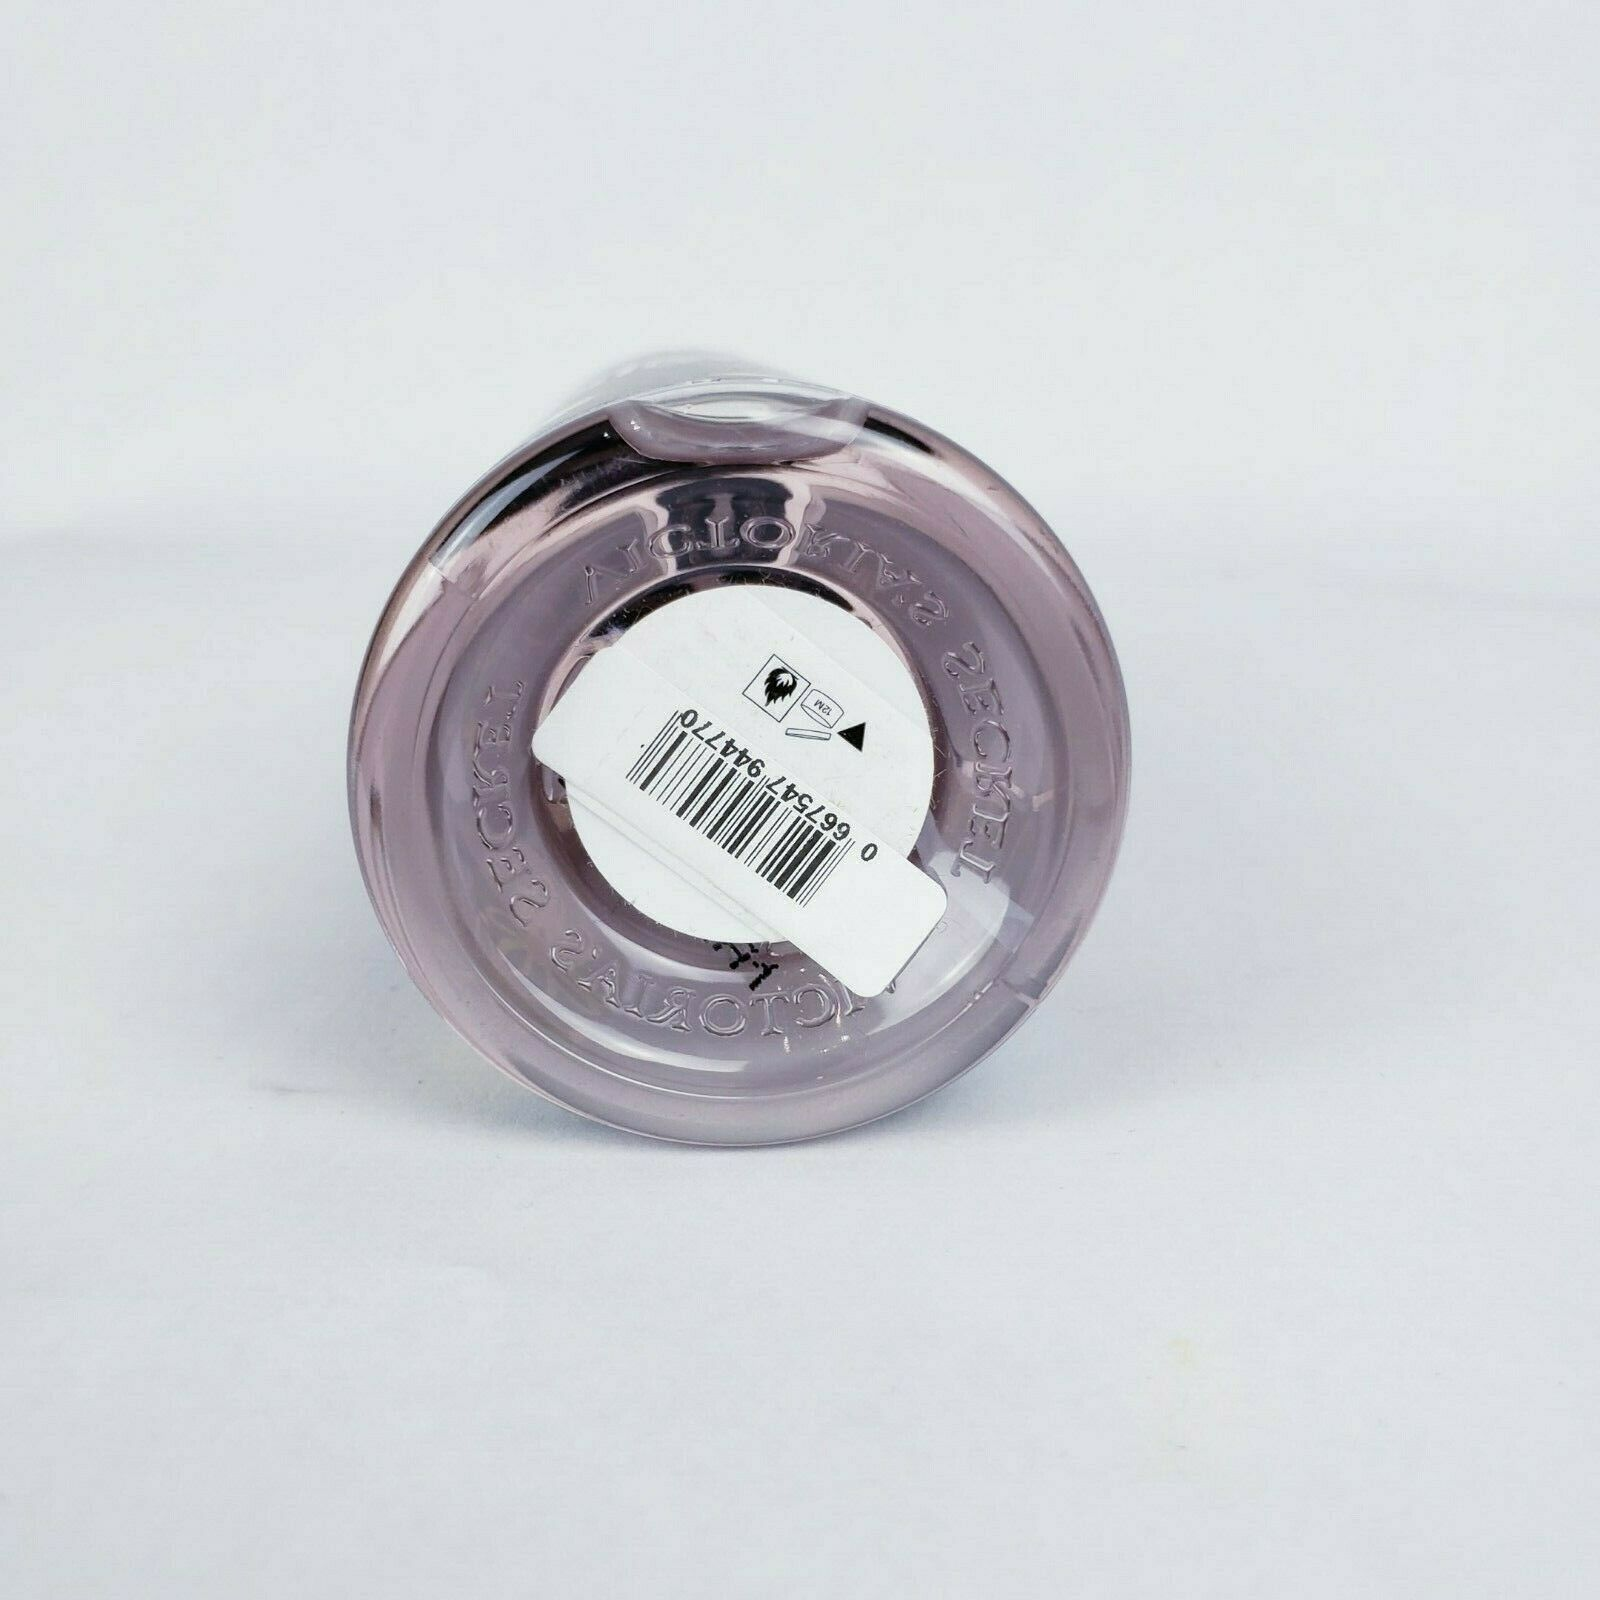 Victoria's Secret PETAL EDGE Fragrance Mist 8.4oz New